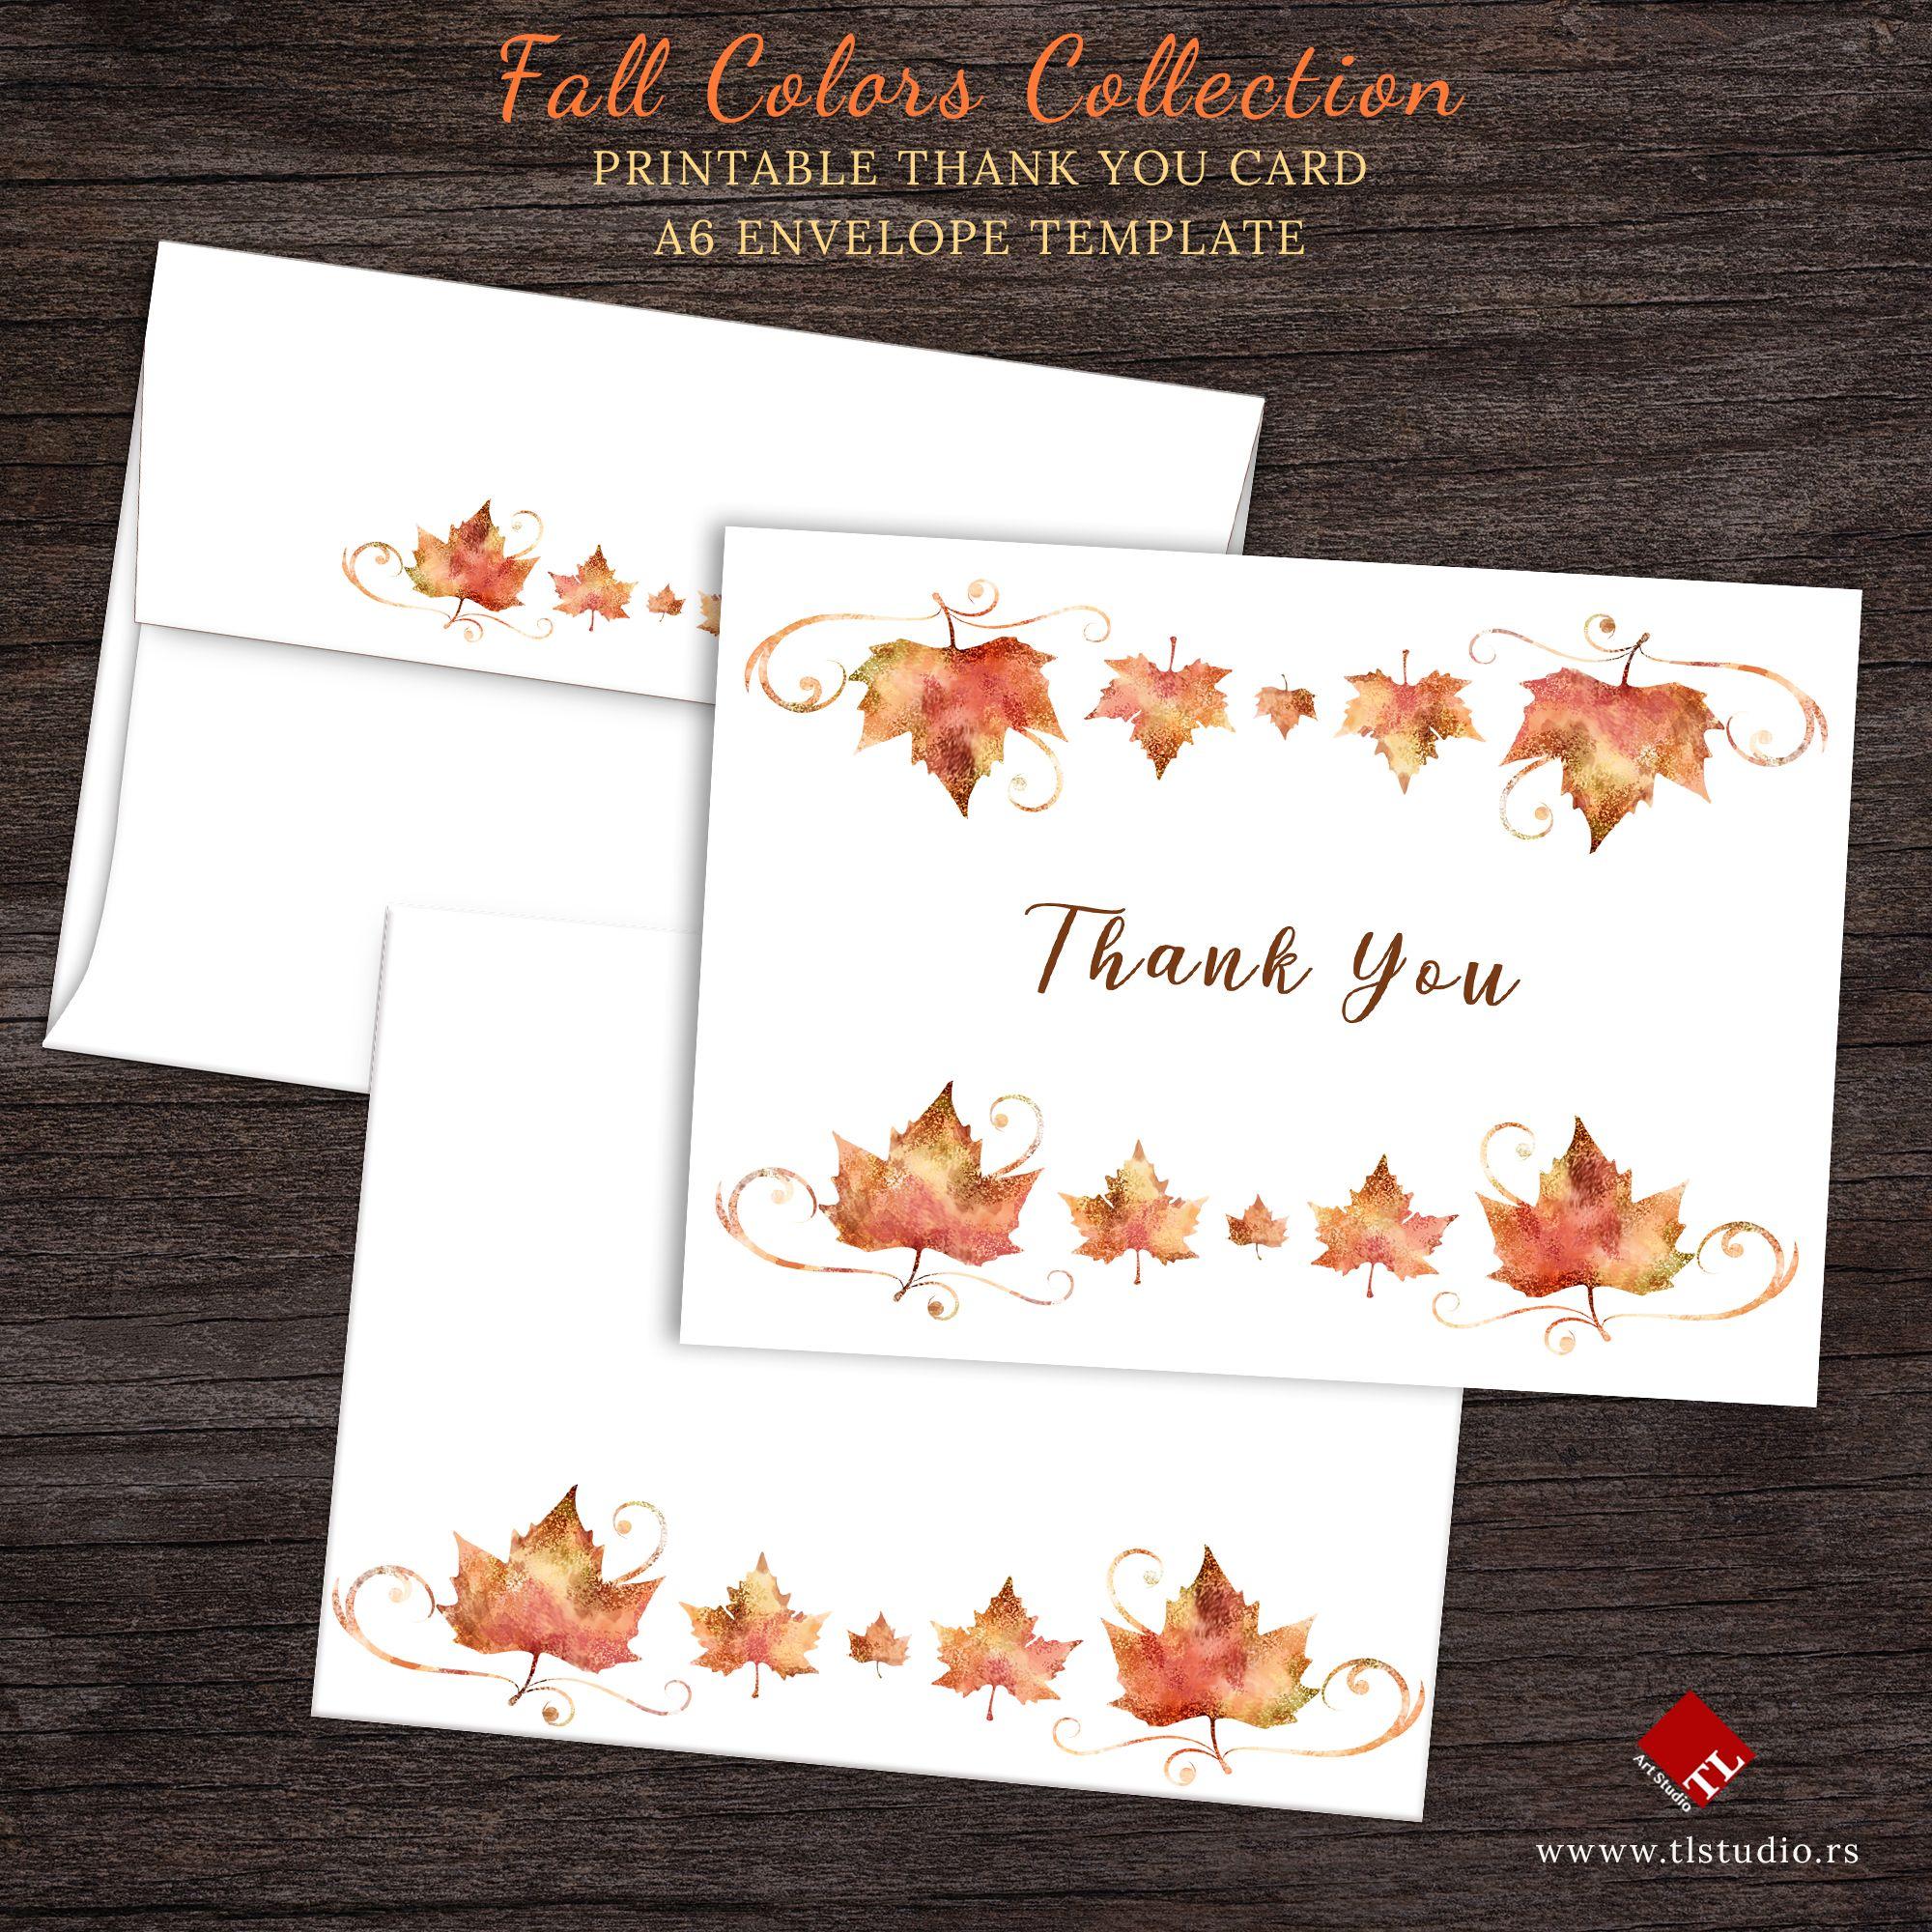 Printable Autumn Thank You Card Printable Thank You Cards Thank You Card Template Printable Stationery